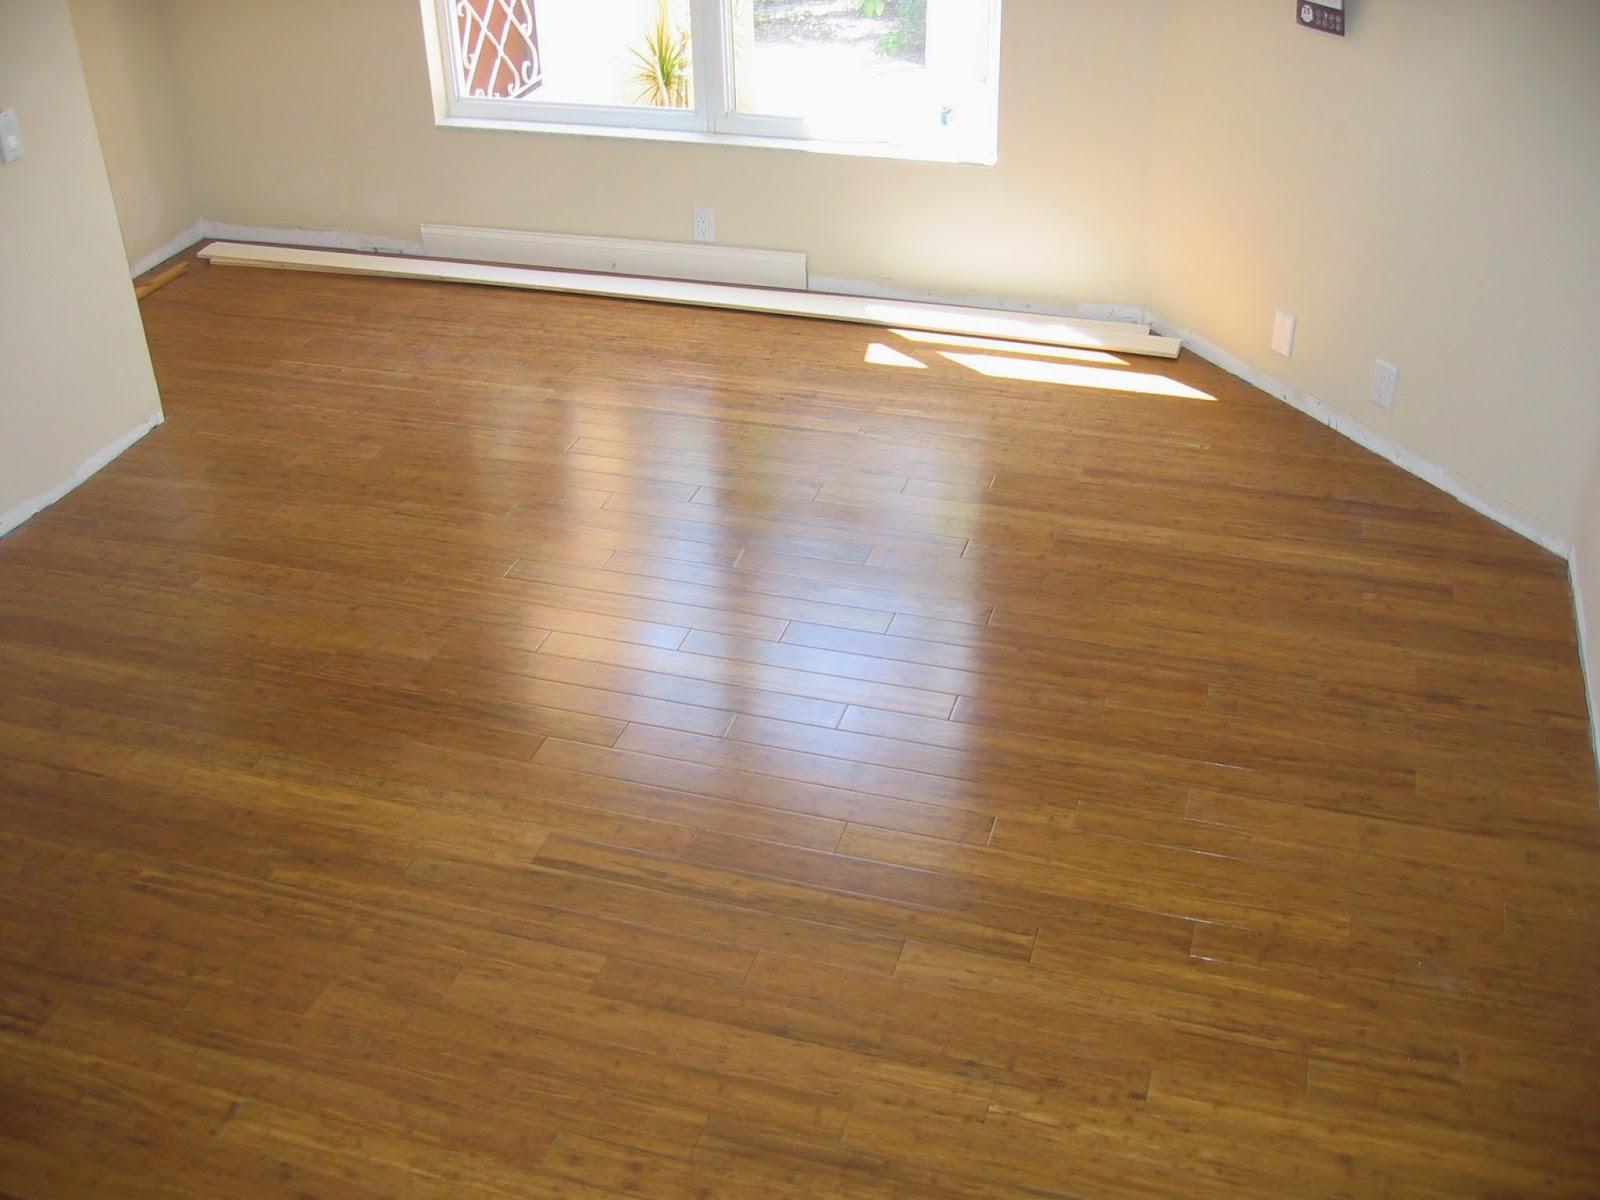 Tile Sarasota Bamboo Wood Floor Installed In Sarasota Home